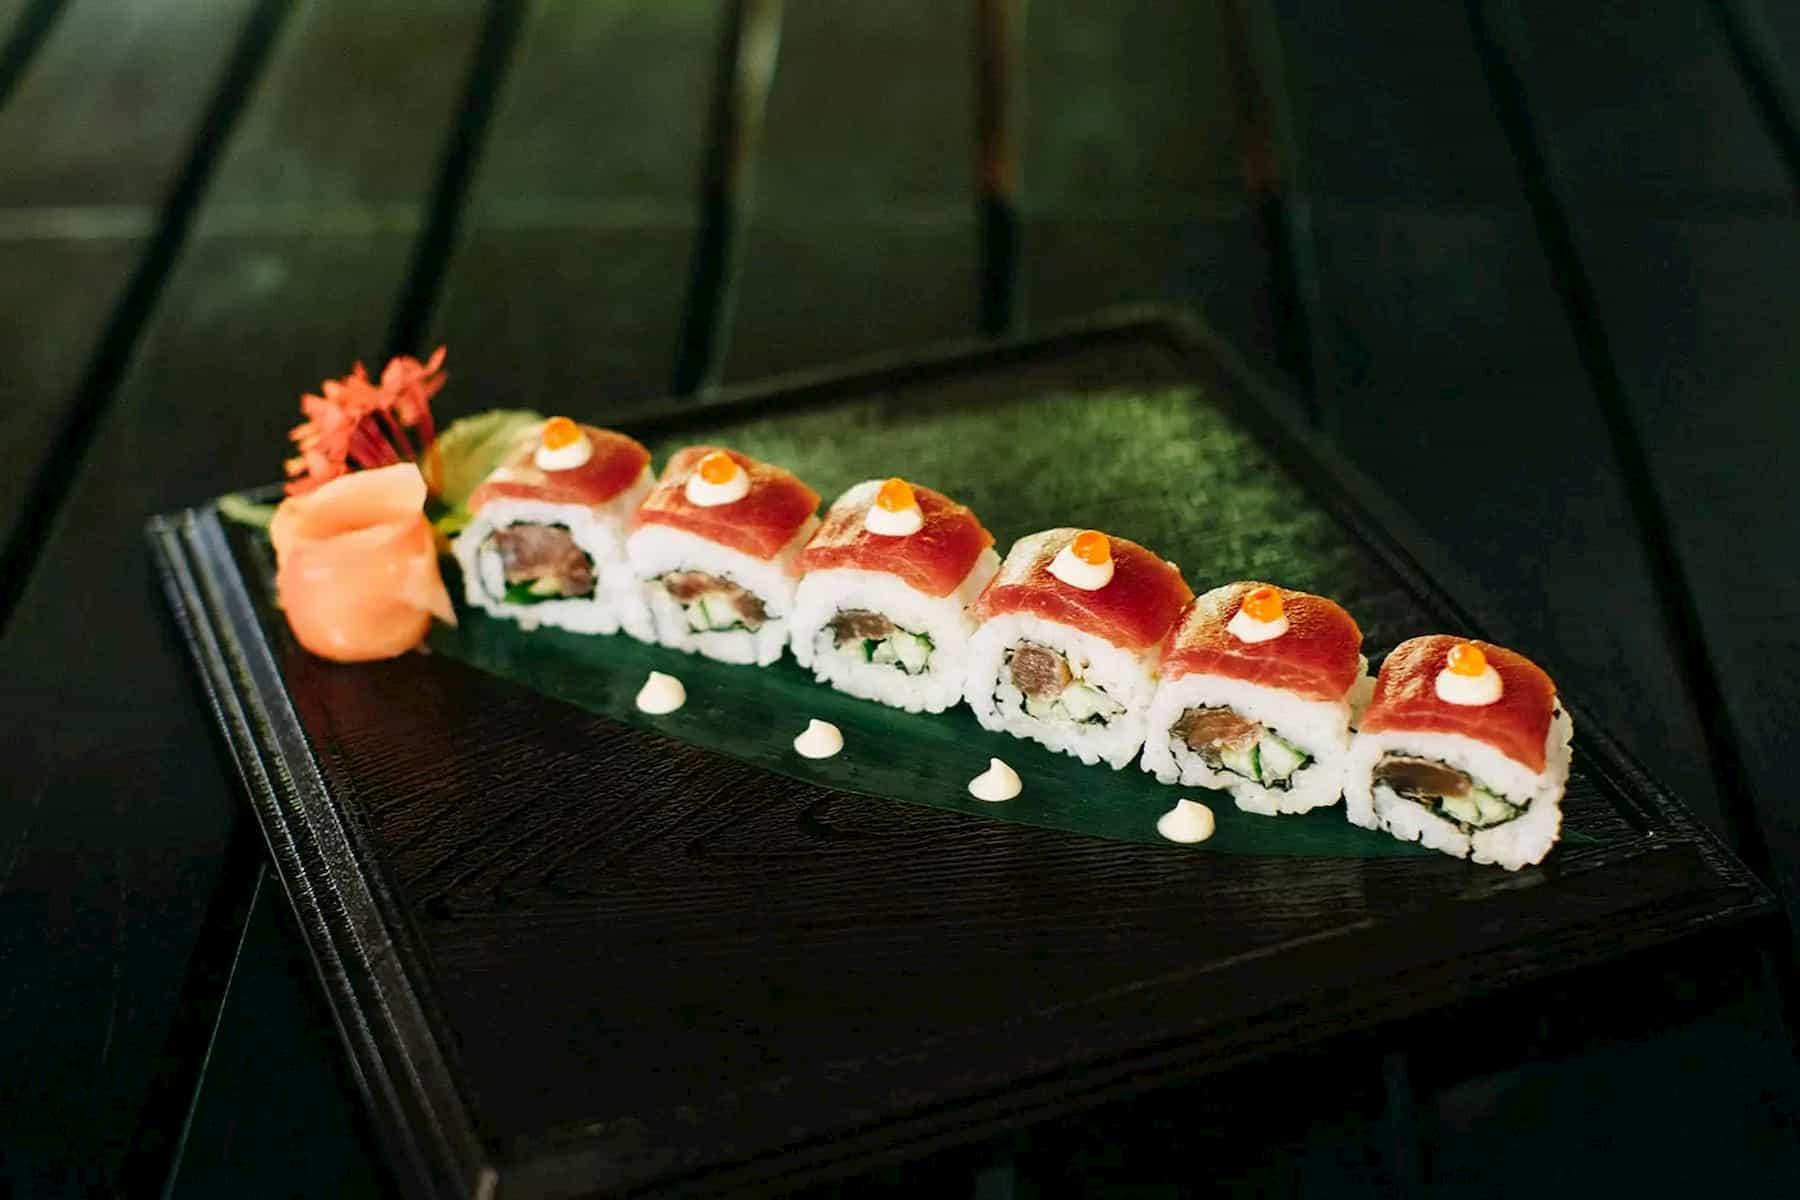 Anantara Veli Resort Maldive ristorante Origami cucina giapponese